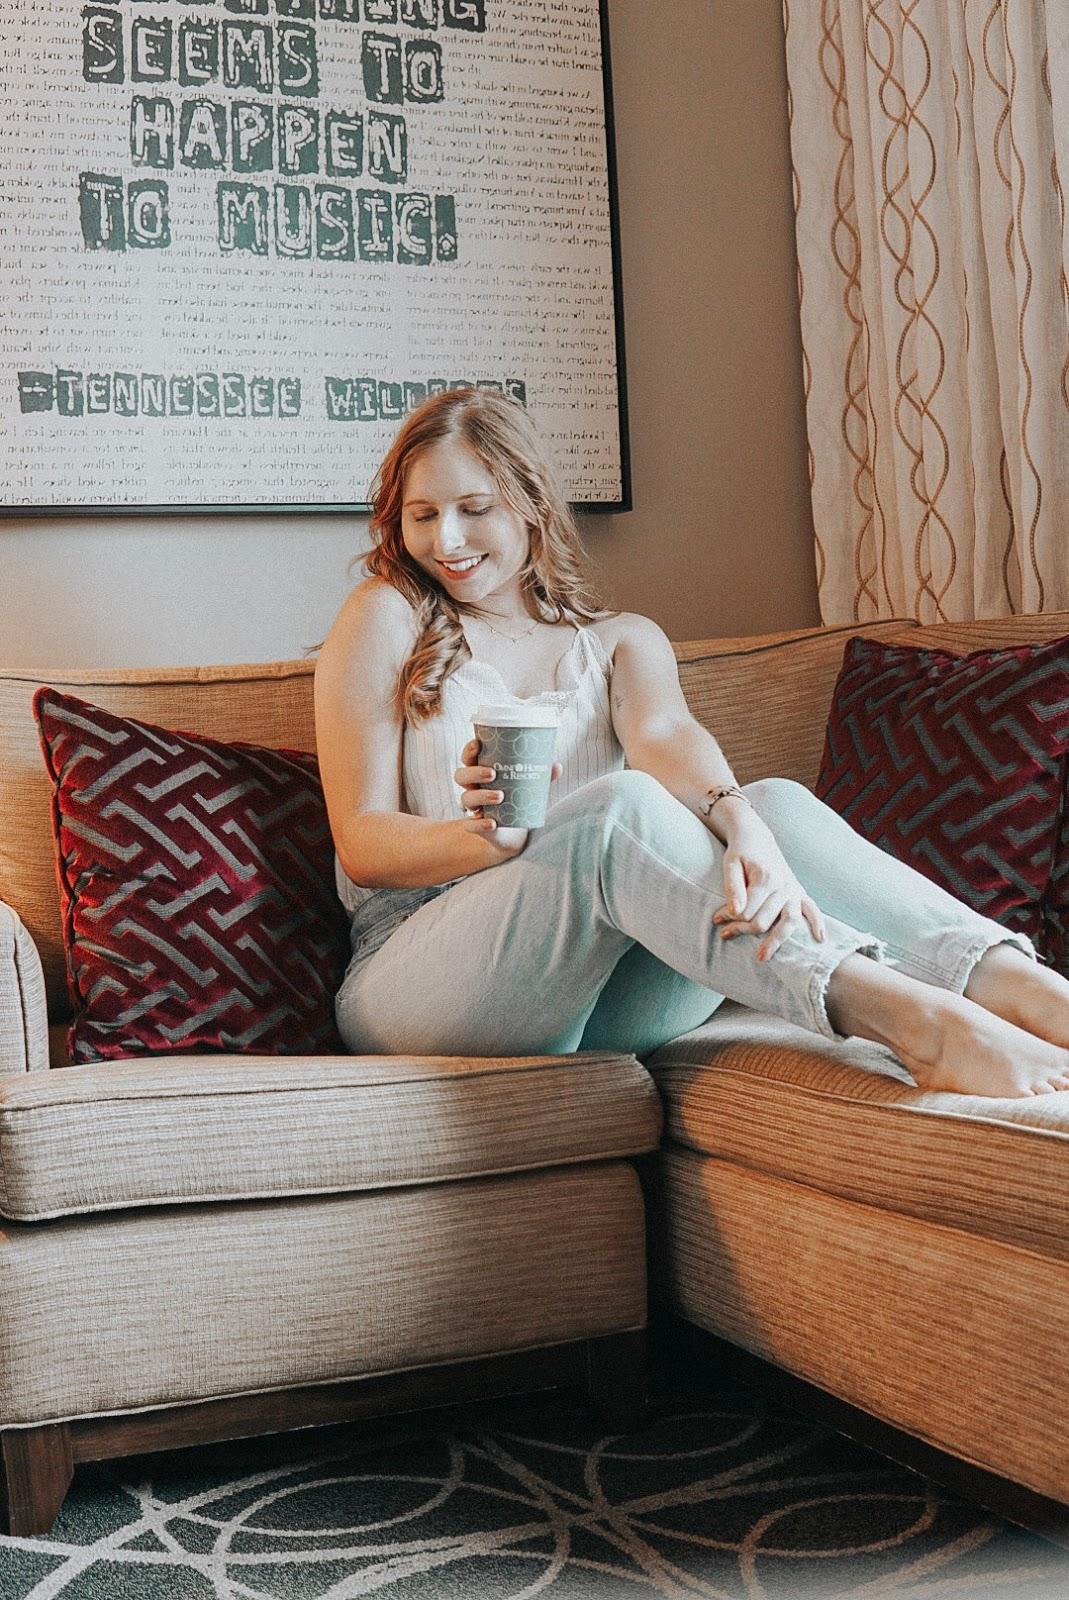 Nashville Travel Guide: My Stay at Omni Nashville Hotel